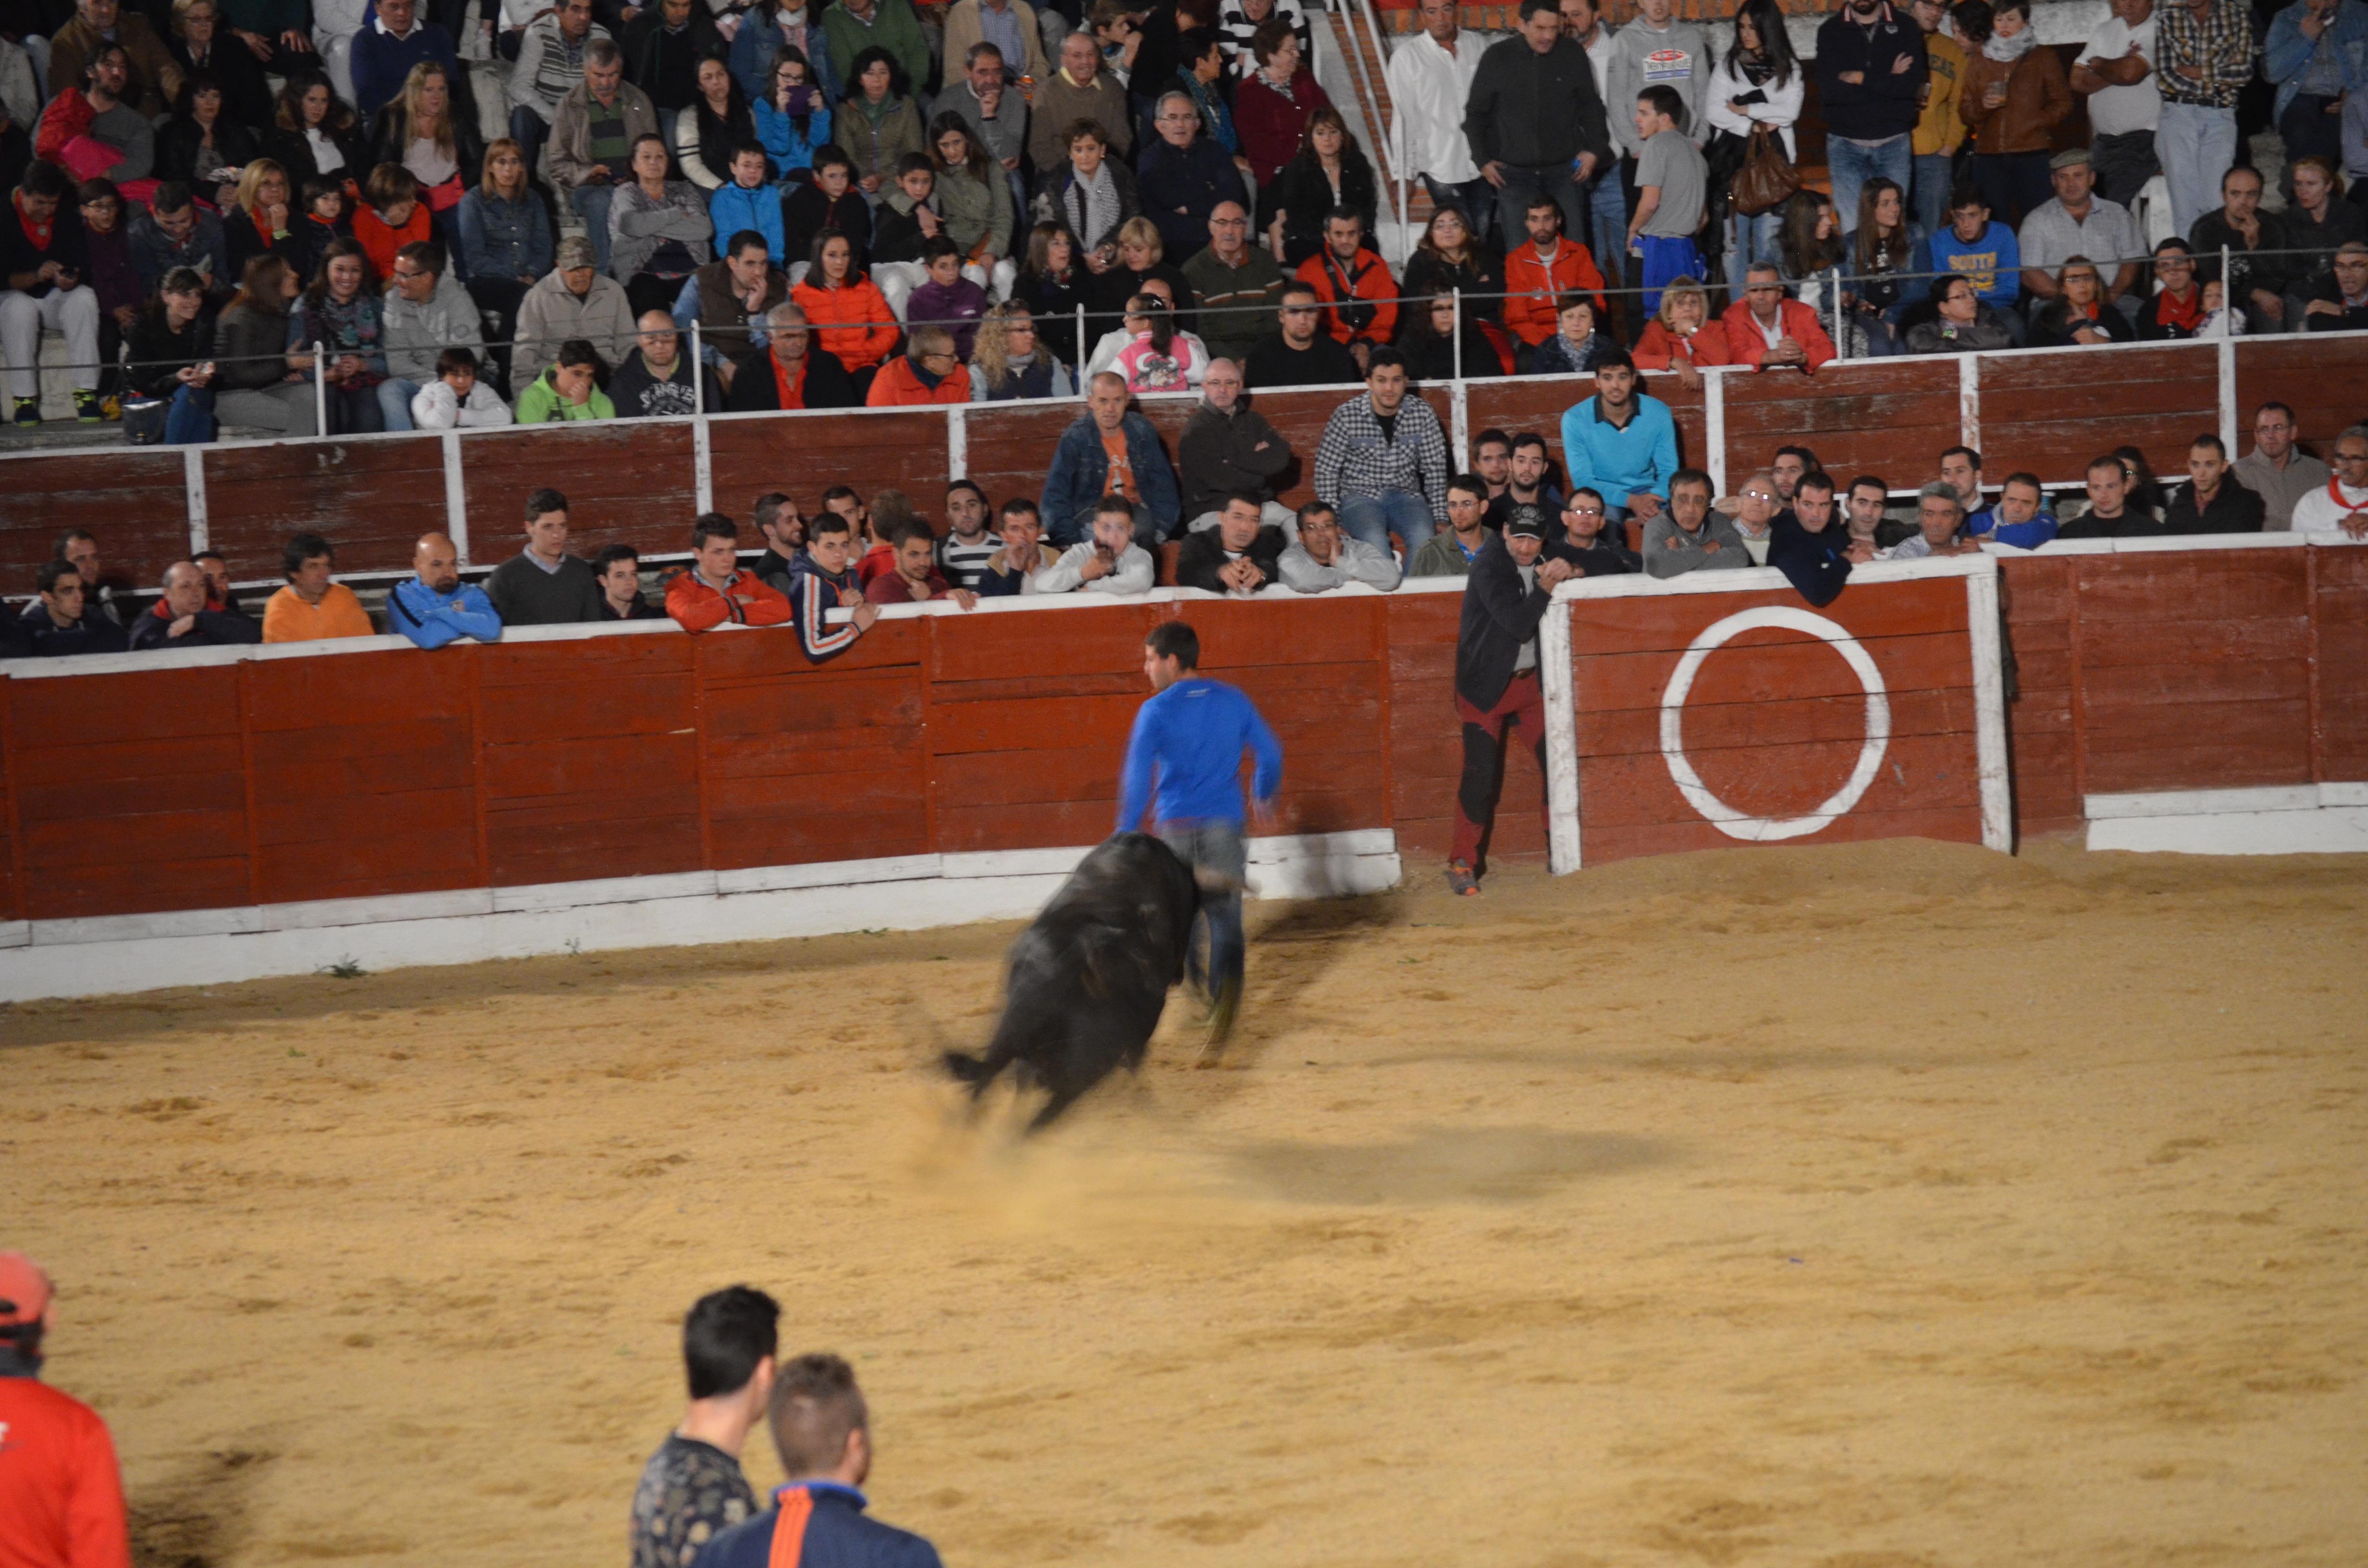 Proctor en Segovia visits Nieva